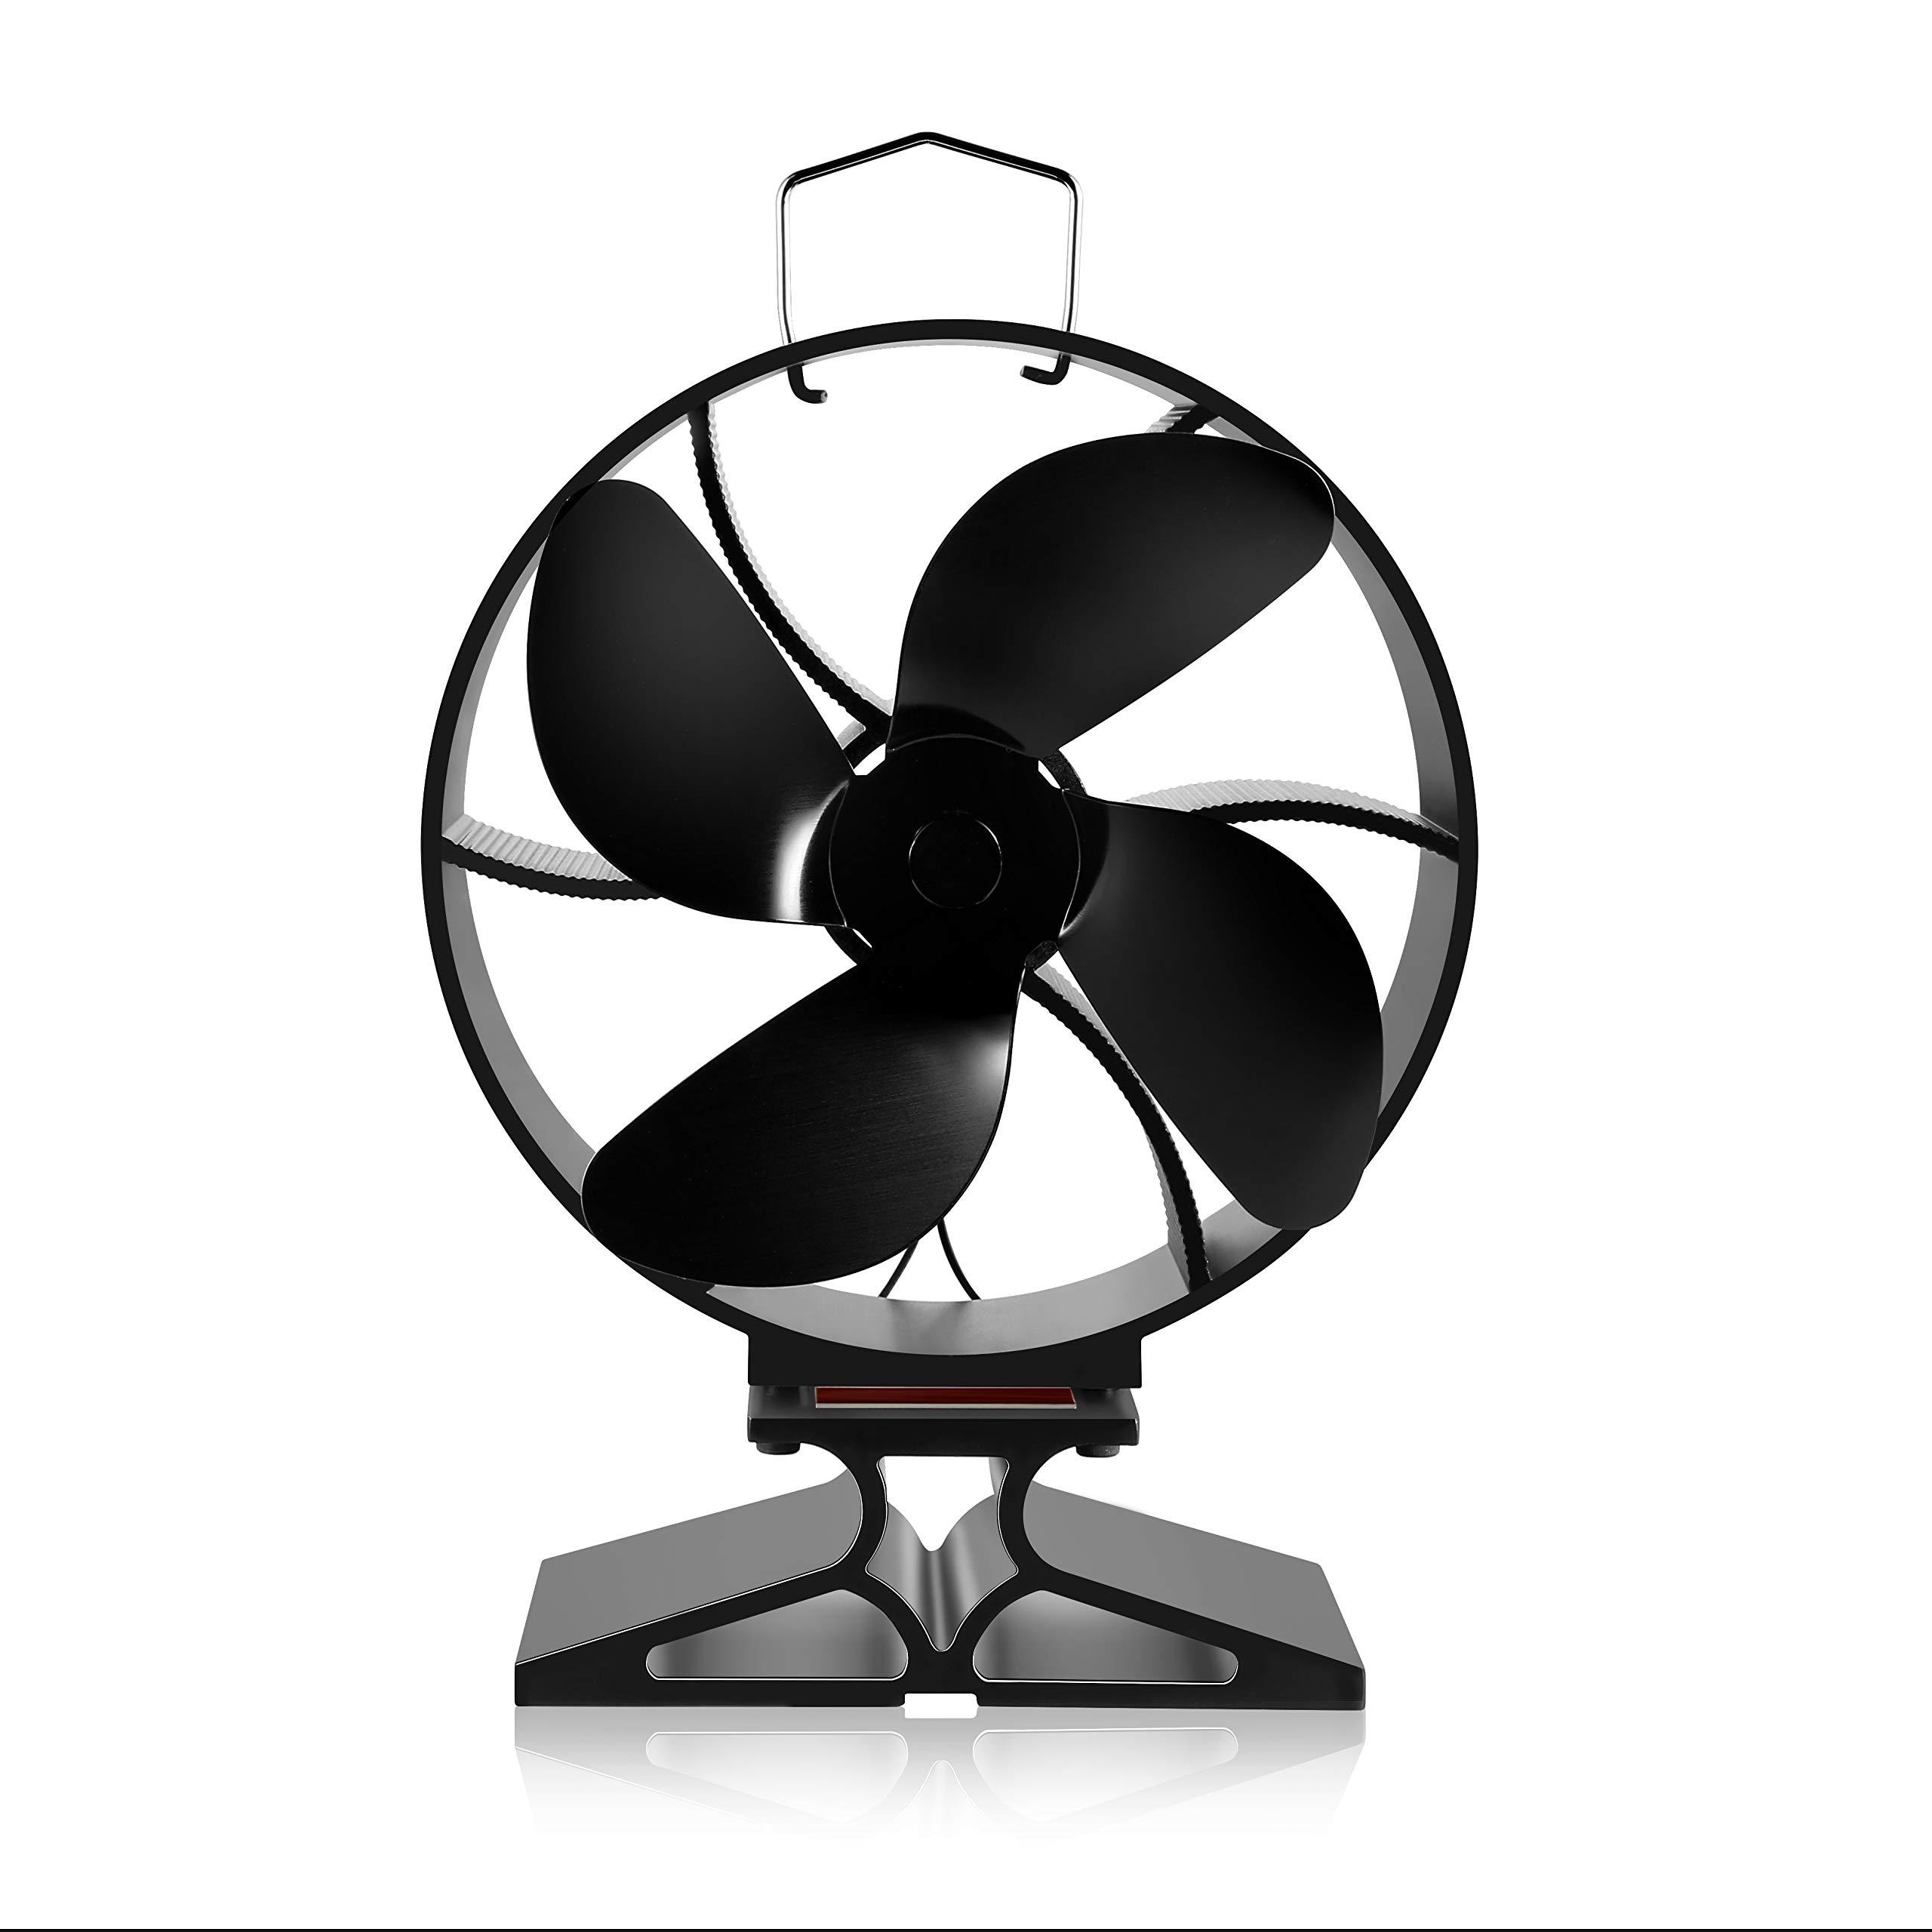 Morinoli Upgraded 4 Blade Fireplace Fan Heat Powered Stove Fan for Wood/Log Burner/Fireplace ,Eco Friendly and Efficient Heat Distribution Fan,Black,Round by Morinoli